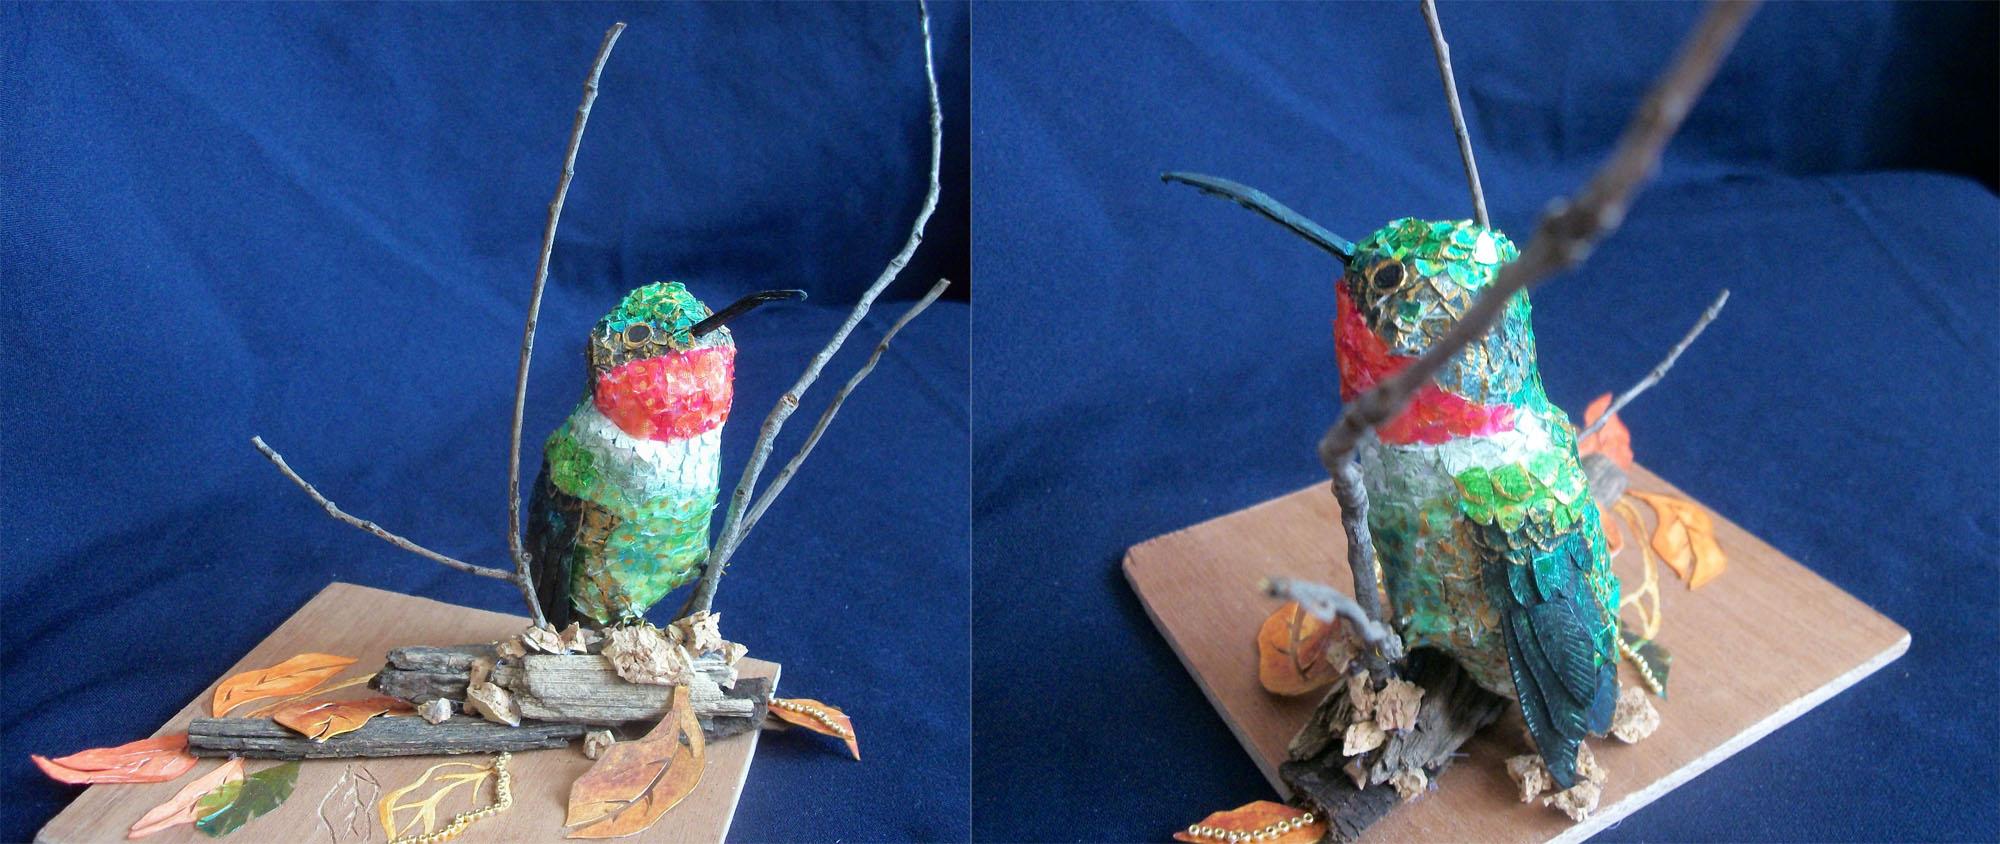 Susan Dorsey_Male Ruby-throated Hummingbird